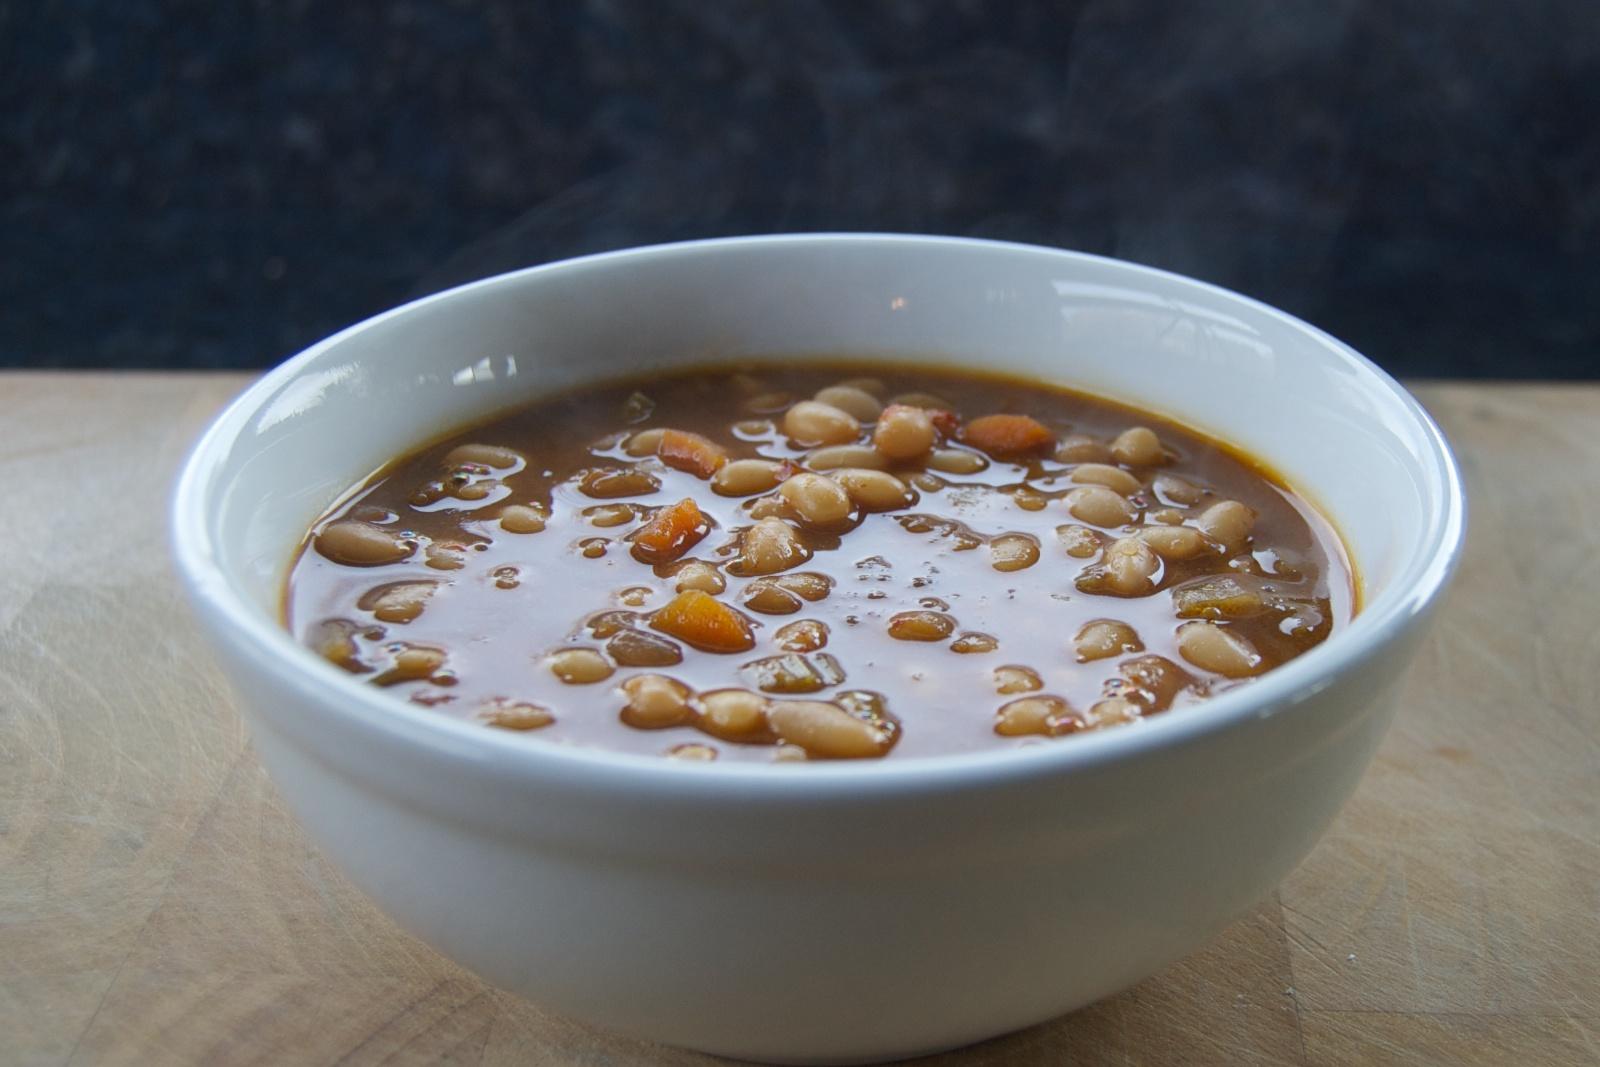 http://blog.rickk.com/food/2013/11/15/ate.2013.11.15.l.jpg